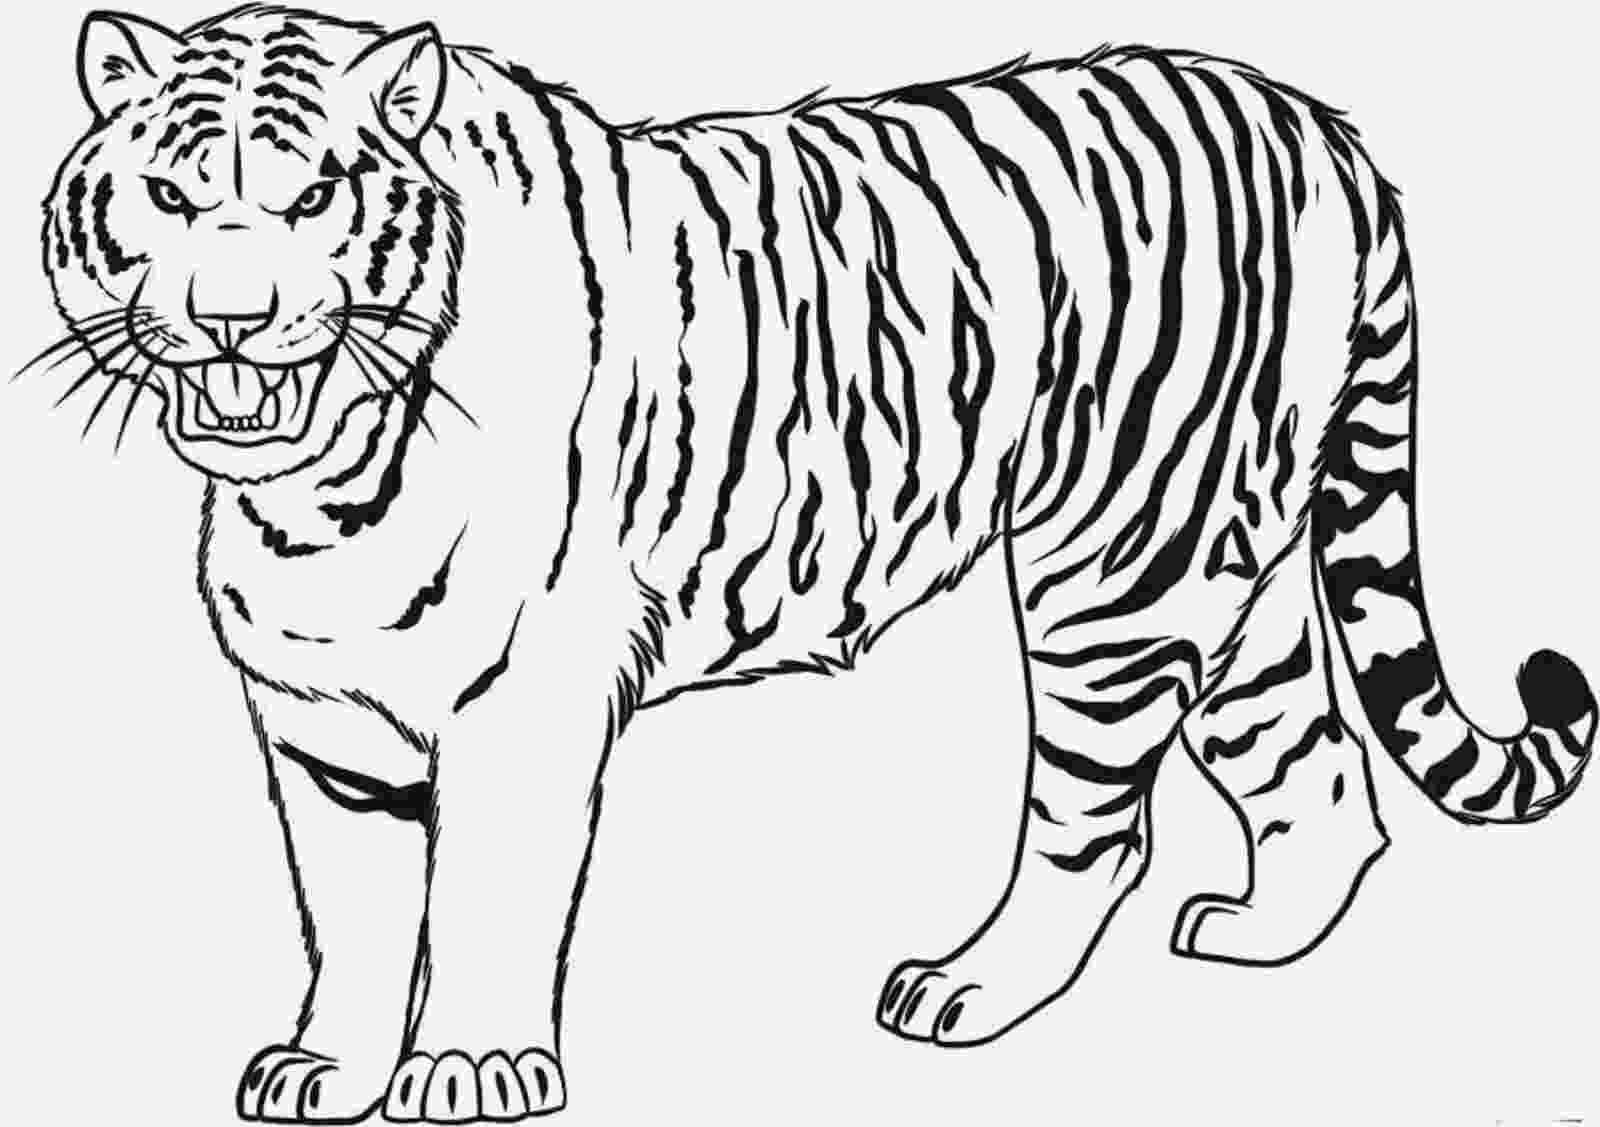 coloring book tiger free printable tiger coloring pages for kids book tiger coloring